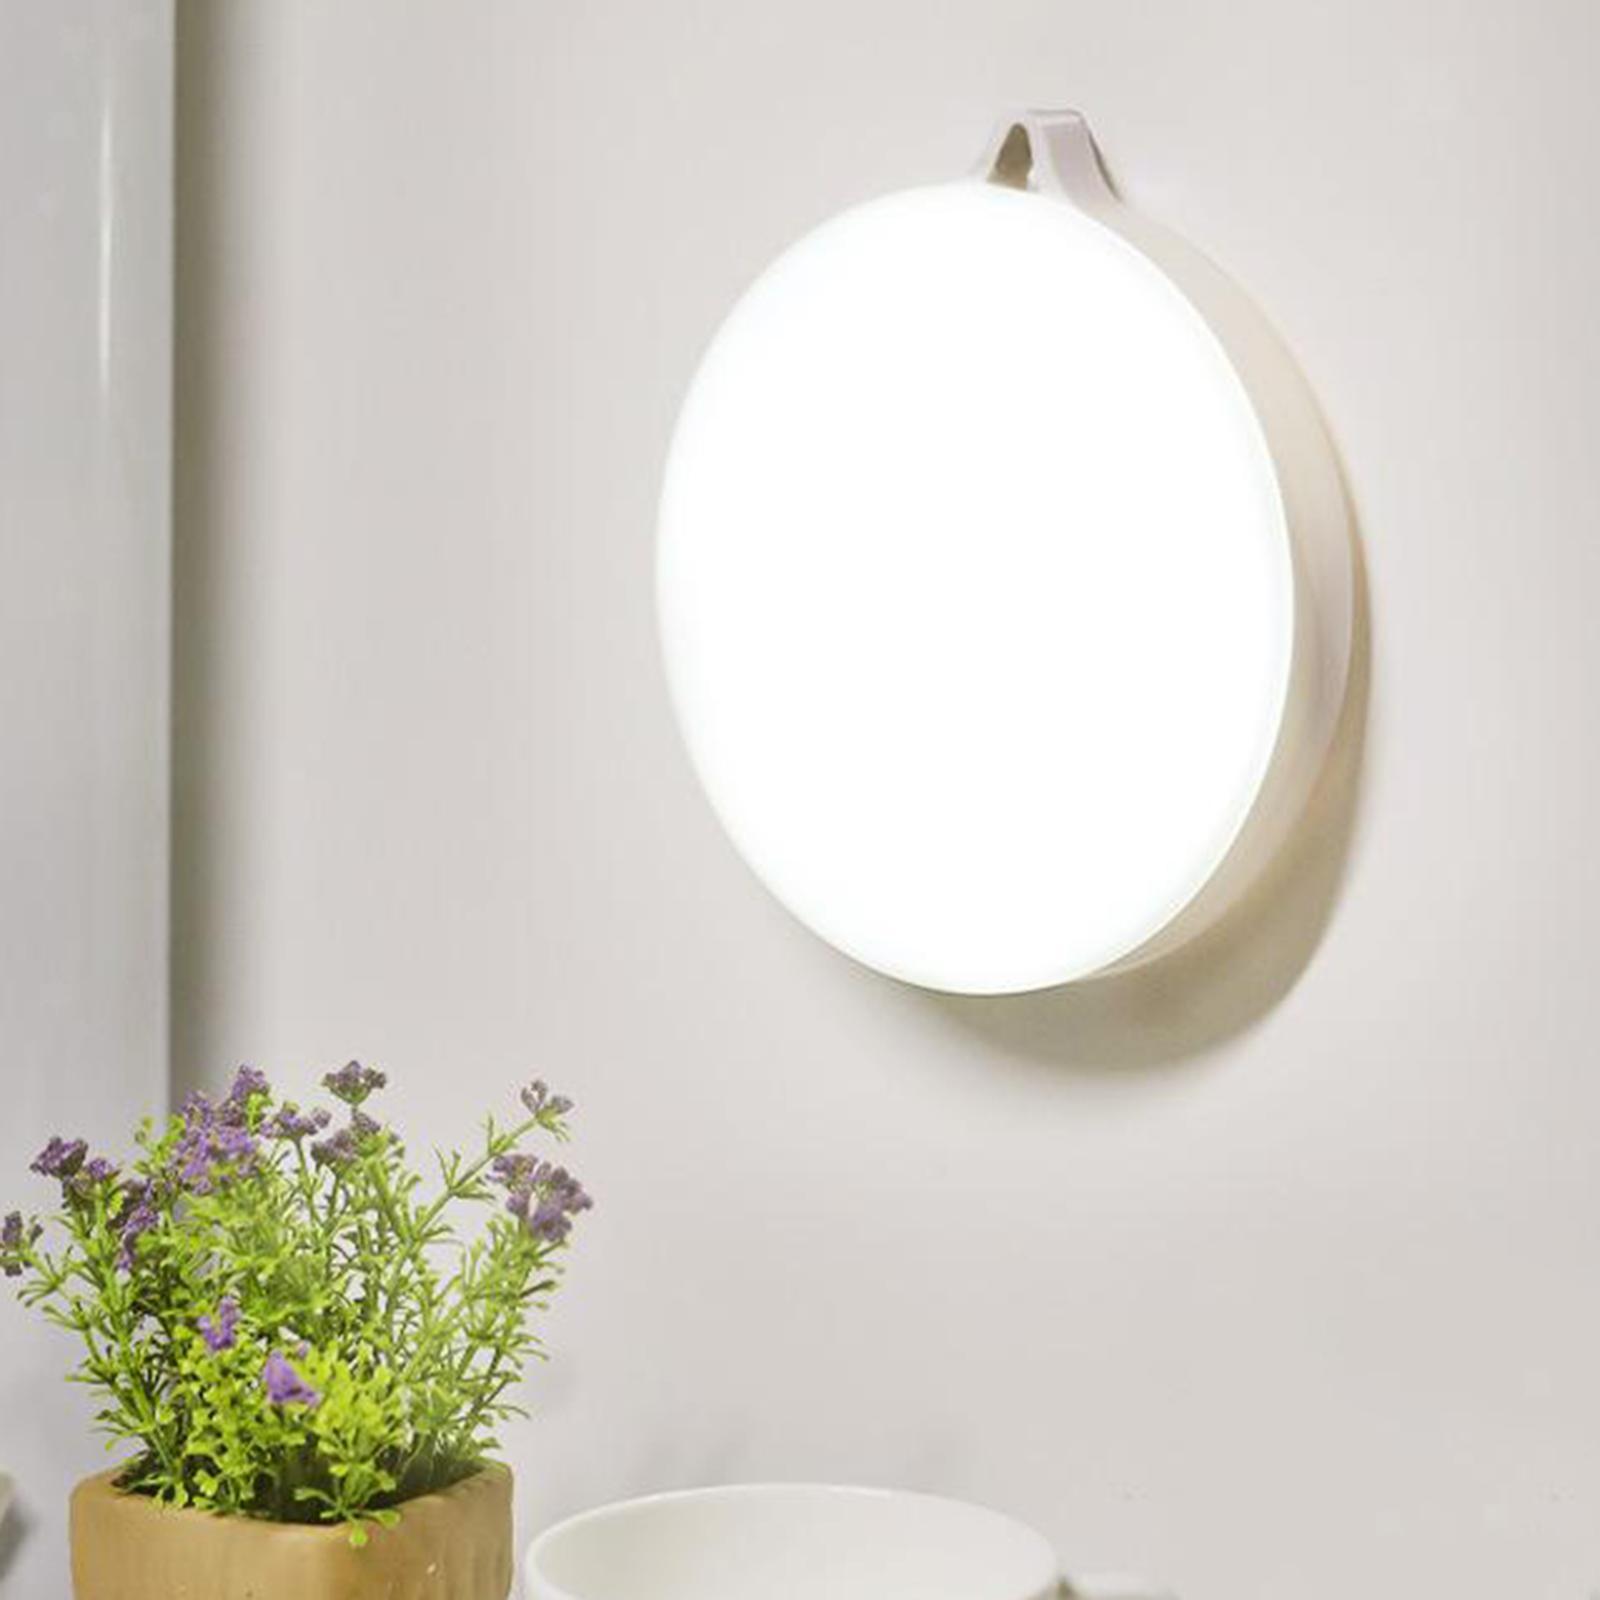 miniatura 23 - Luce notturna a LED per camera da letto ricaricabile USB per Hotel con sensore